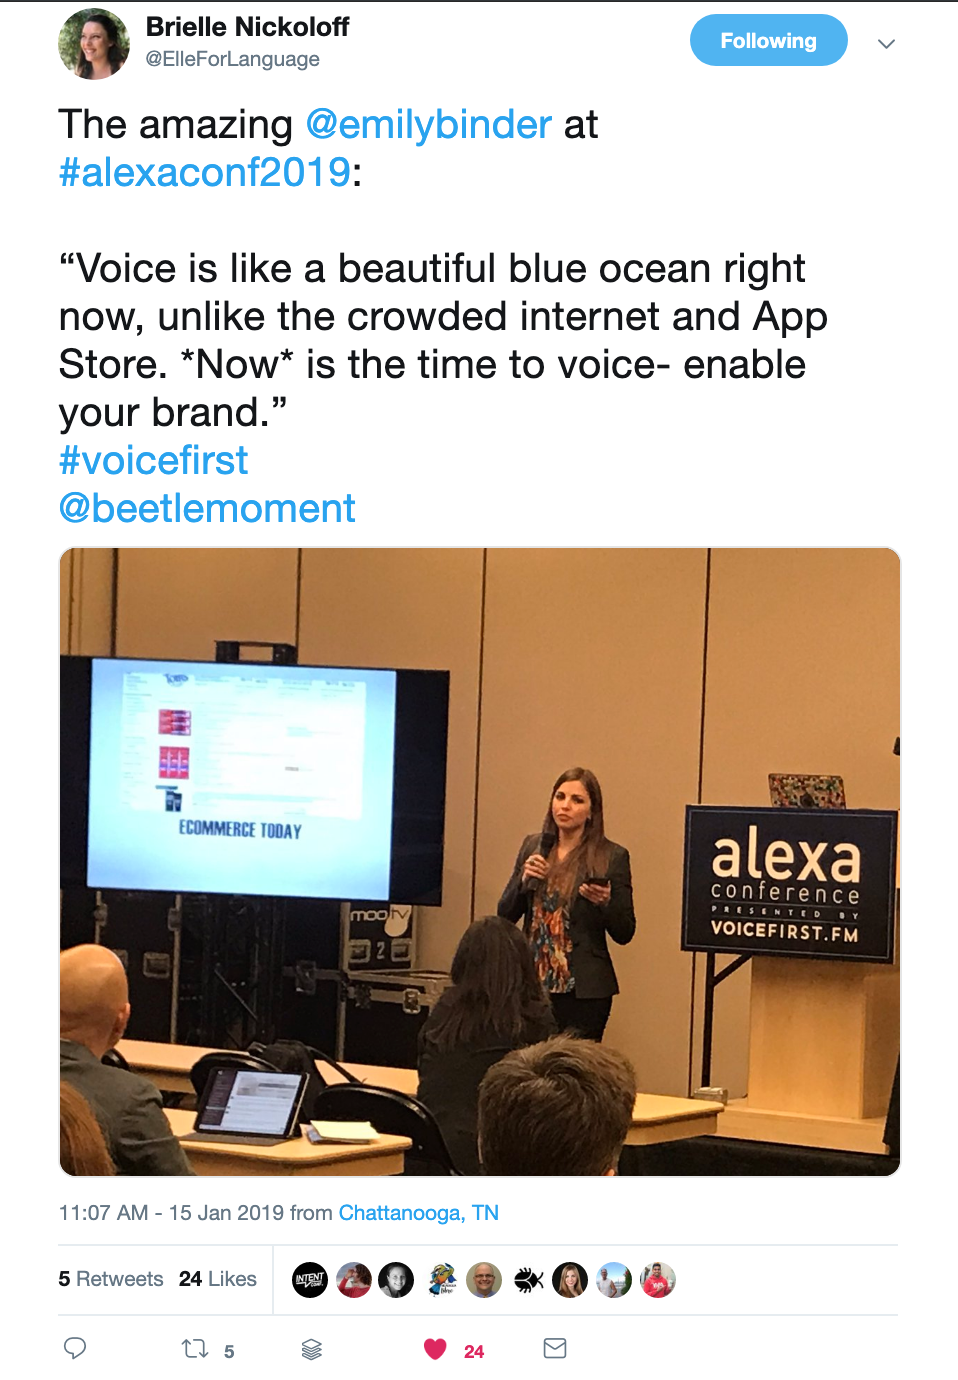 brielle-nickoloff-tweet-emily-binder-alexa-conference-voice-blue-ocean.png